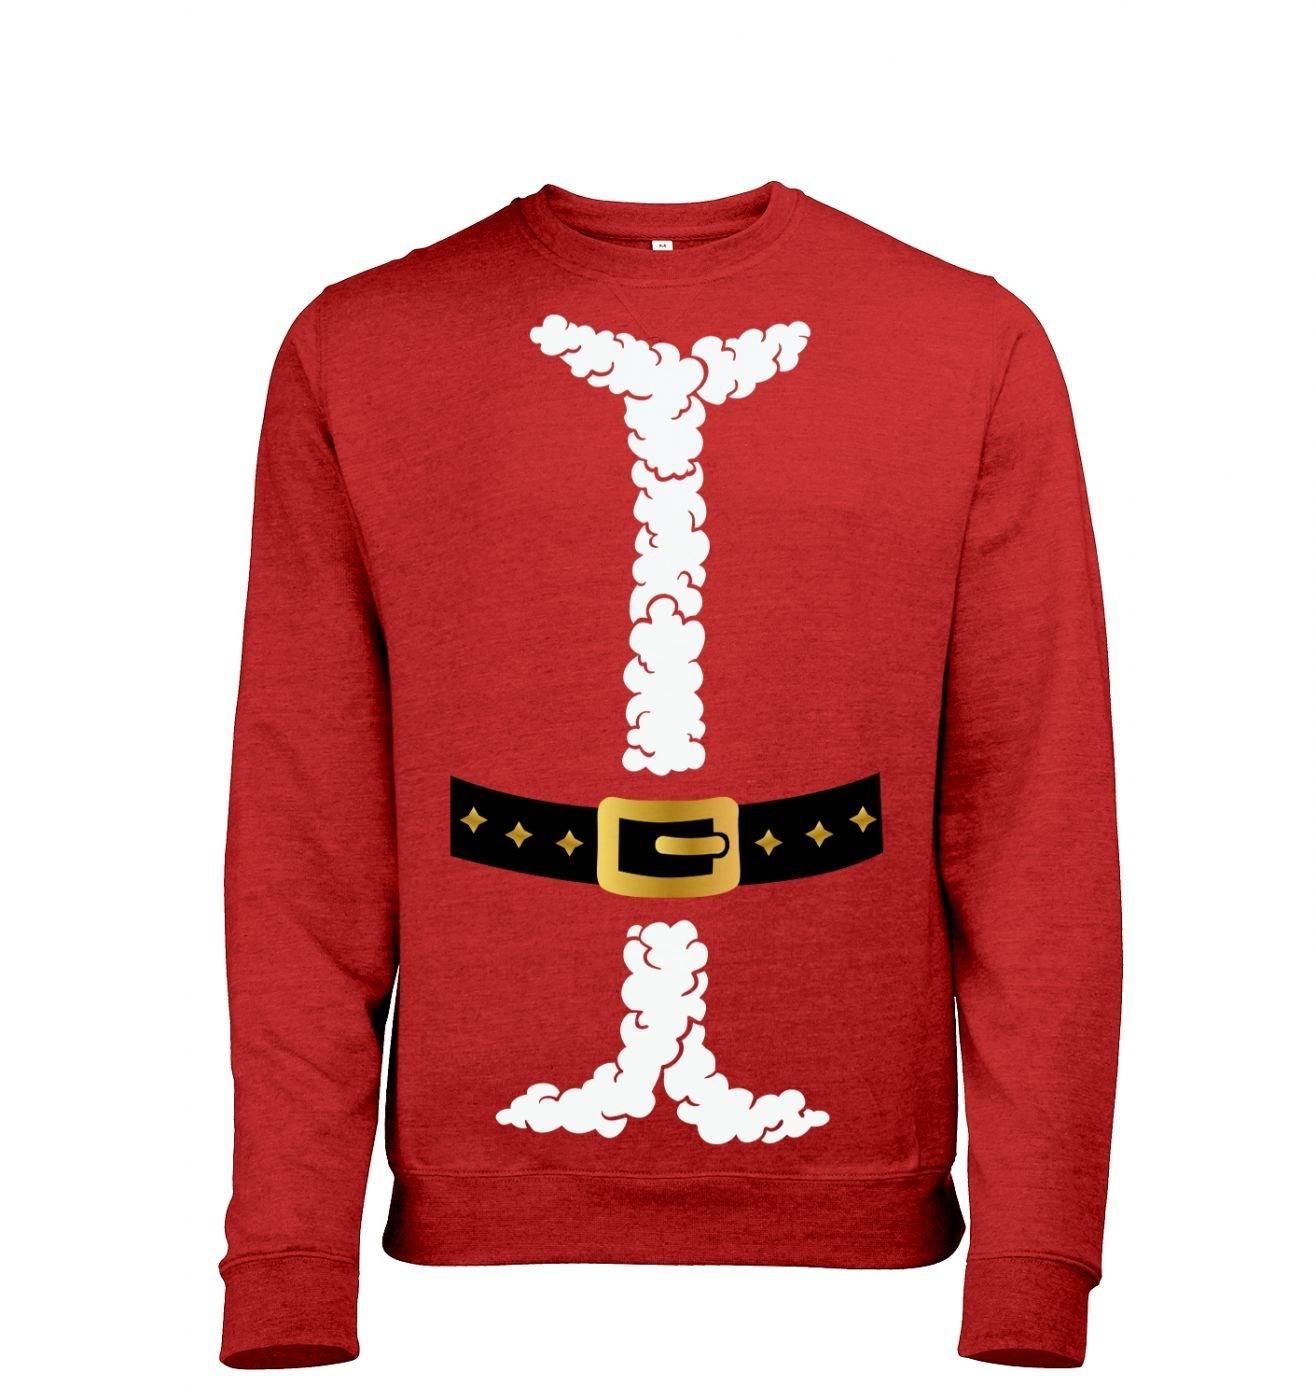 Santa costume sweatshirt (heather)